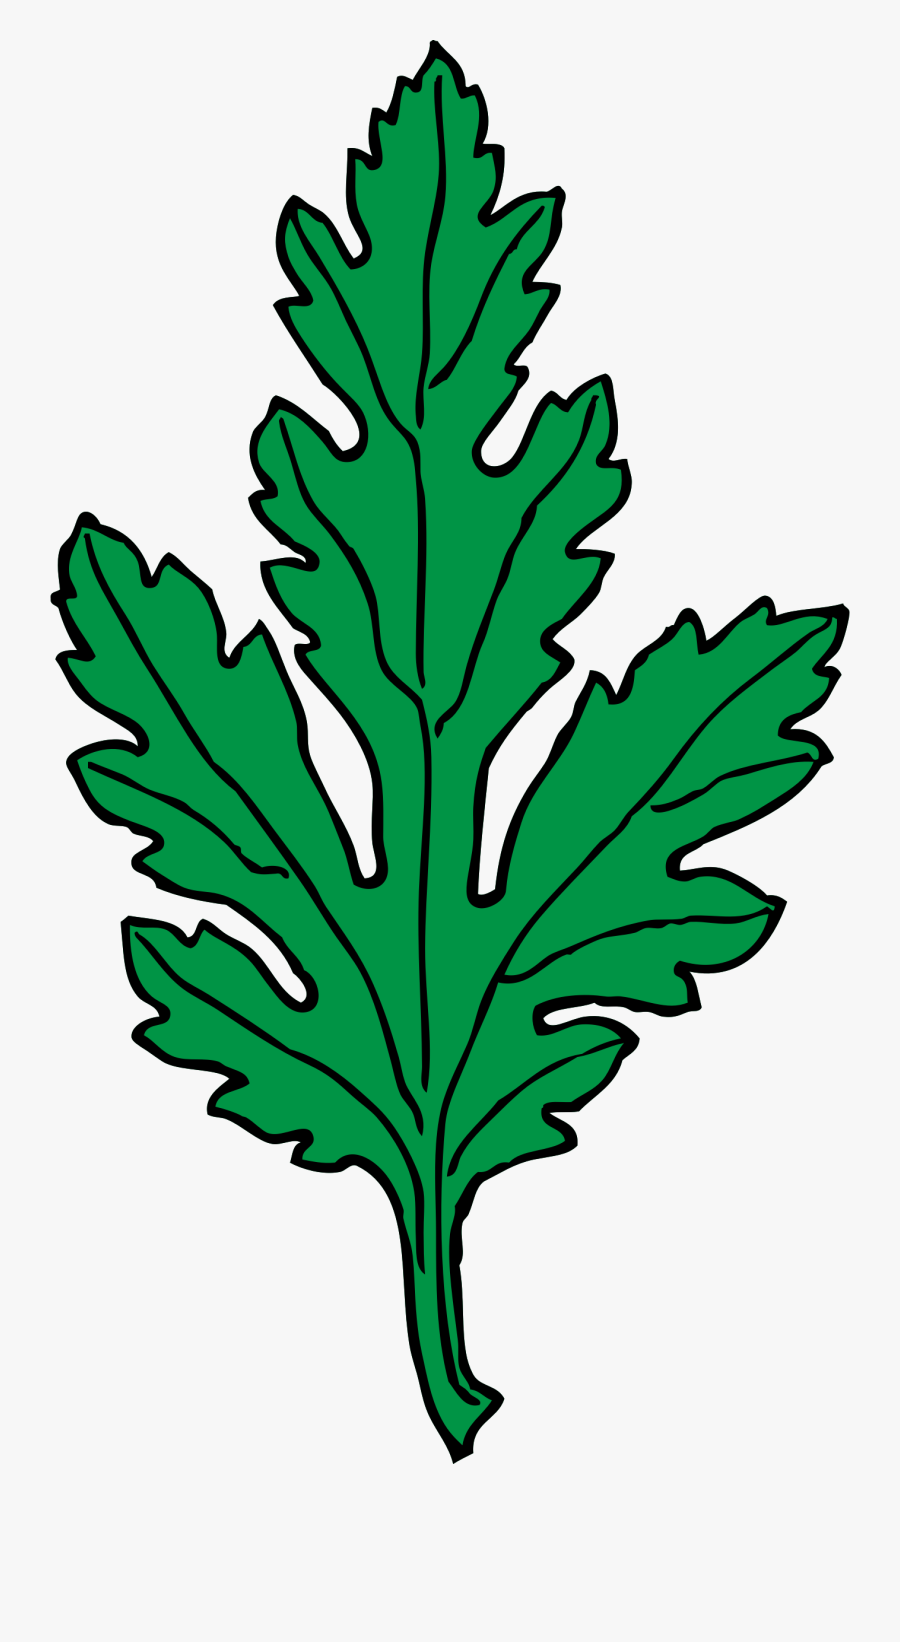 Clipart - Green Leaf Clip Art, Transparent Clipart